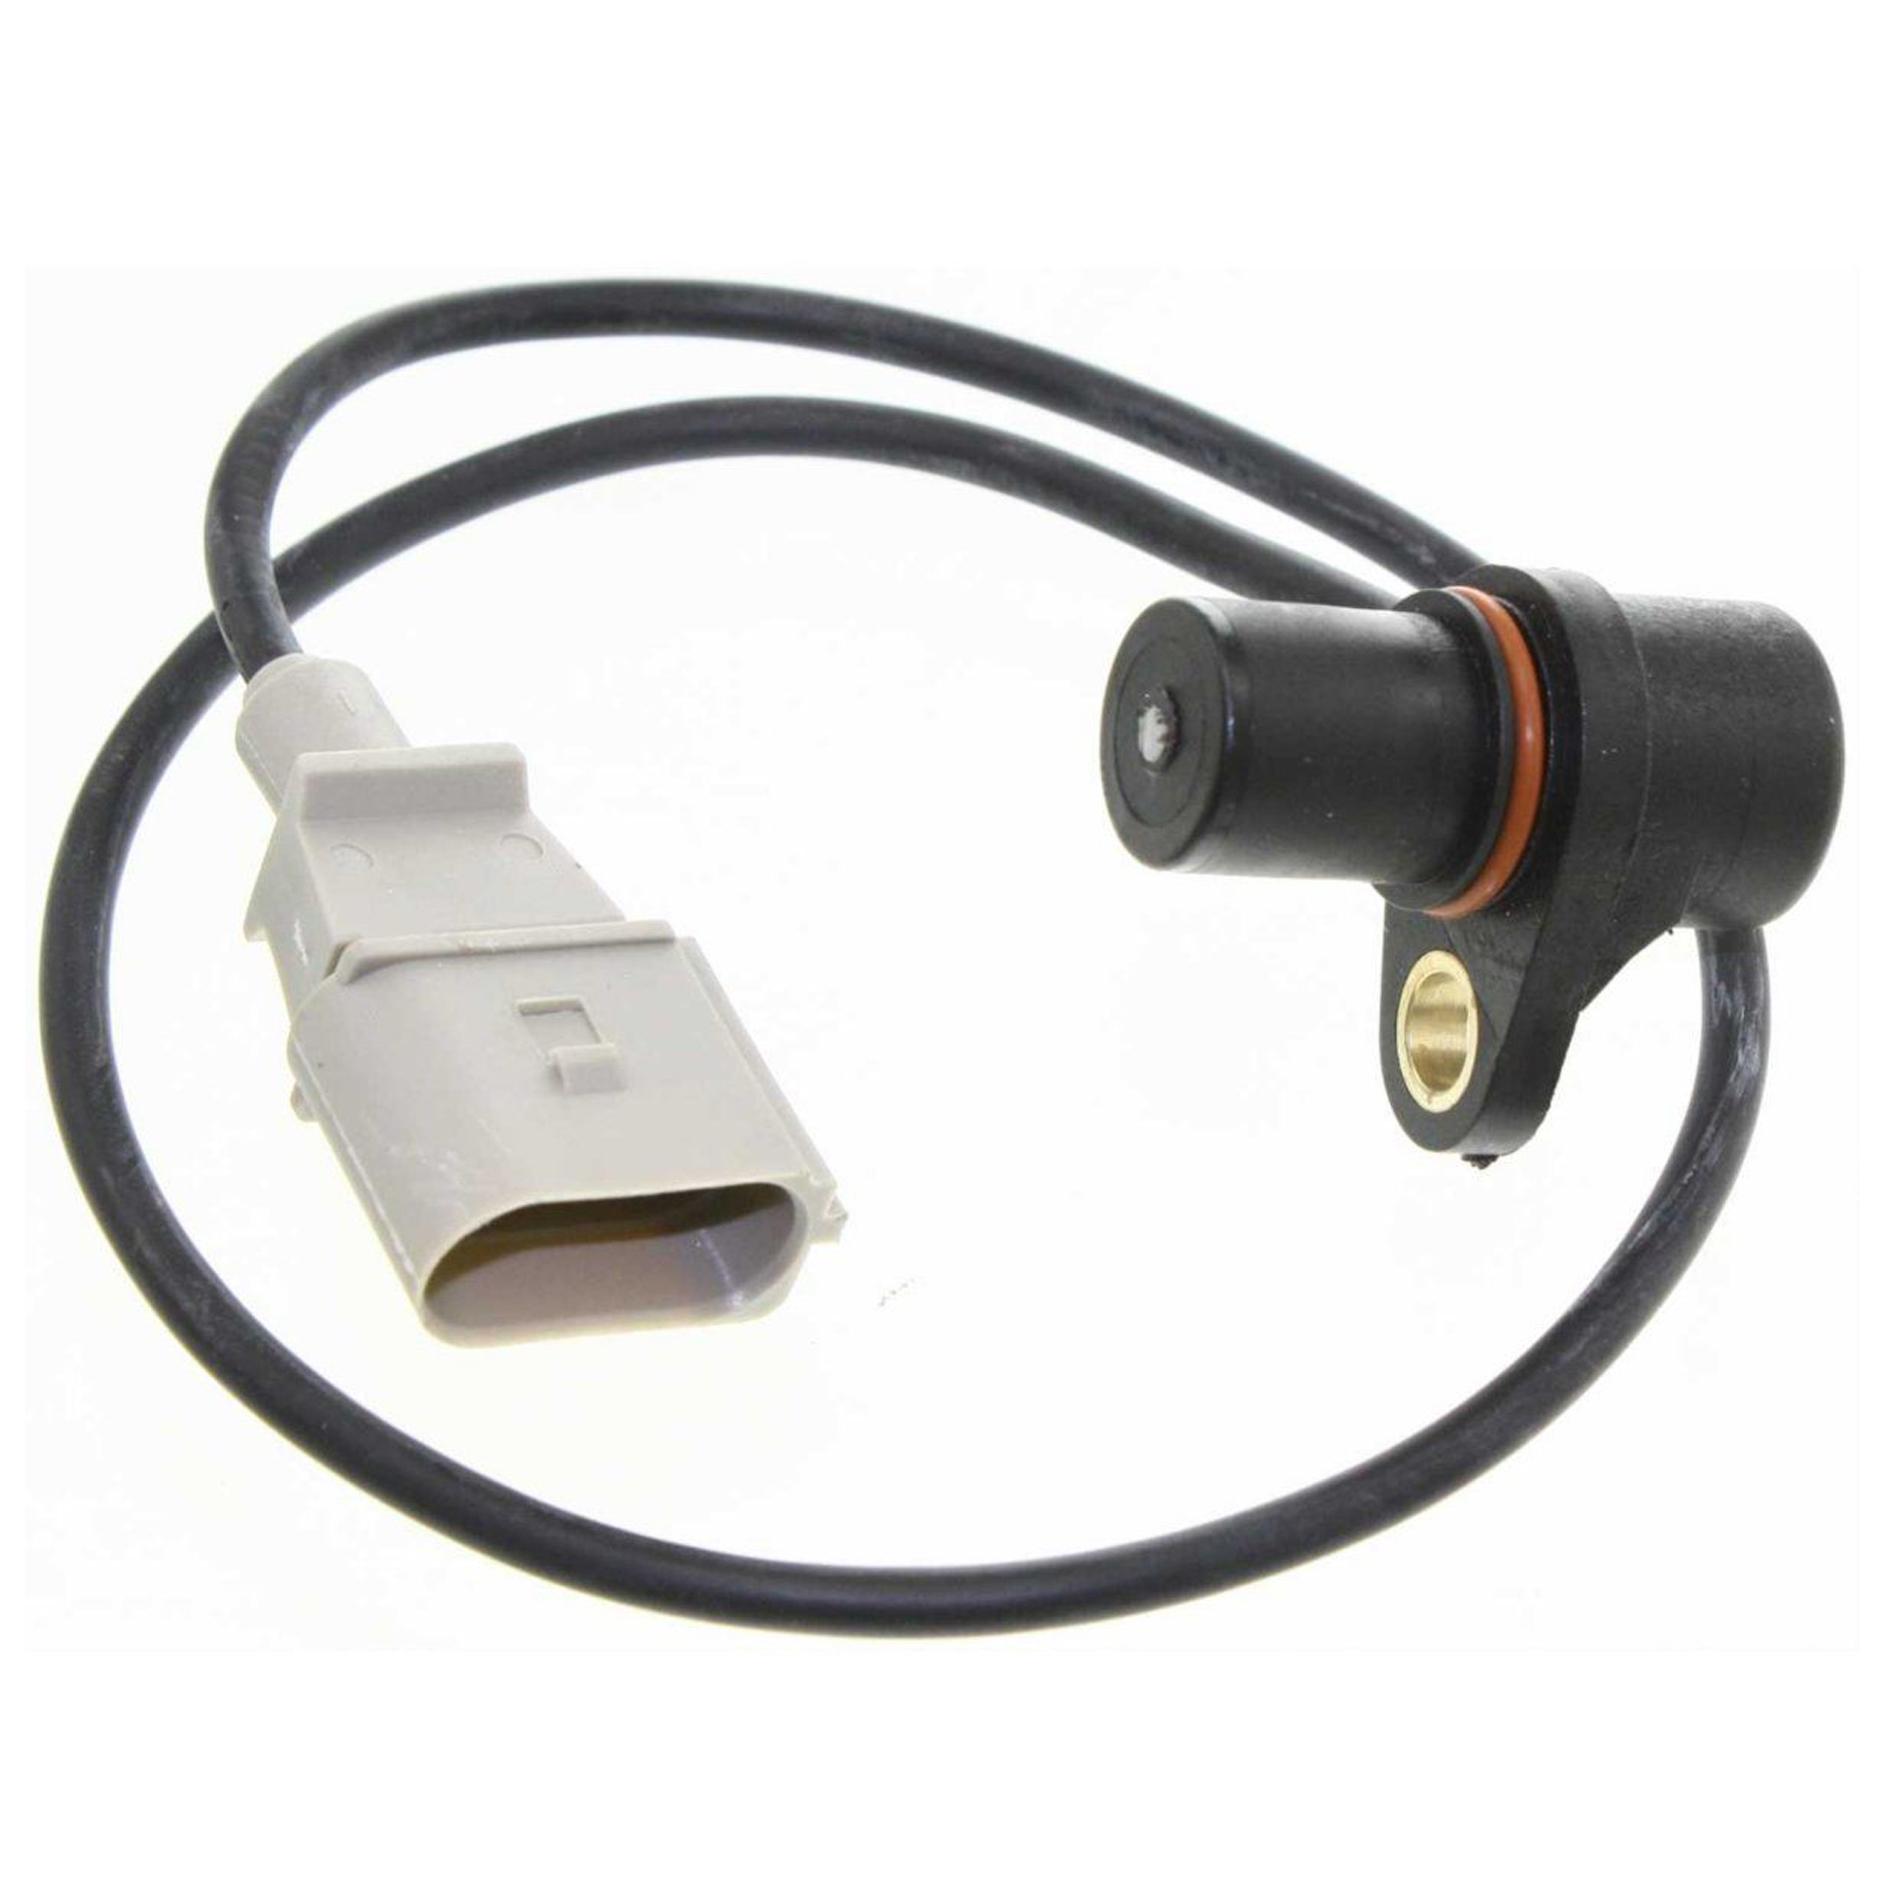 New Crankshaft Position Sensor For 98-05 VW Passat Beetle Jetta Bora 06A906433C